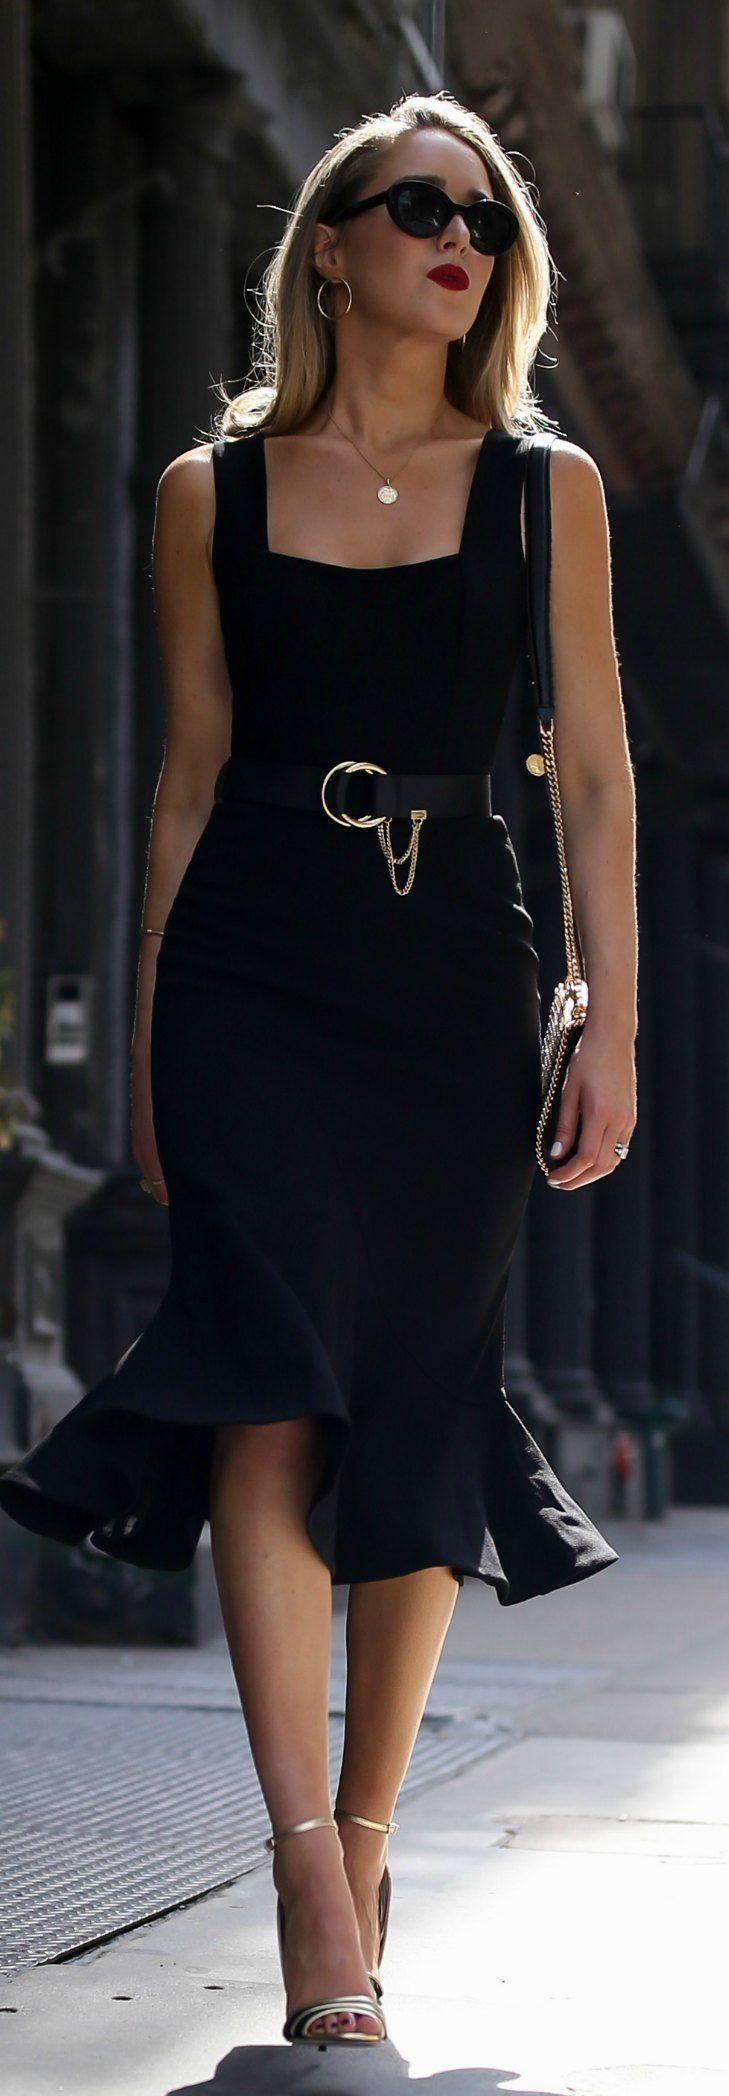 What To Wear On A Date Night Sleeveless Princess Hem Black Midi Dress Black And Gold Open Toe Pumps Black And Fashion Little Black Dress Black Midi Dress [ 2096 x 729 Pixel ]